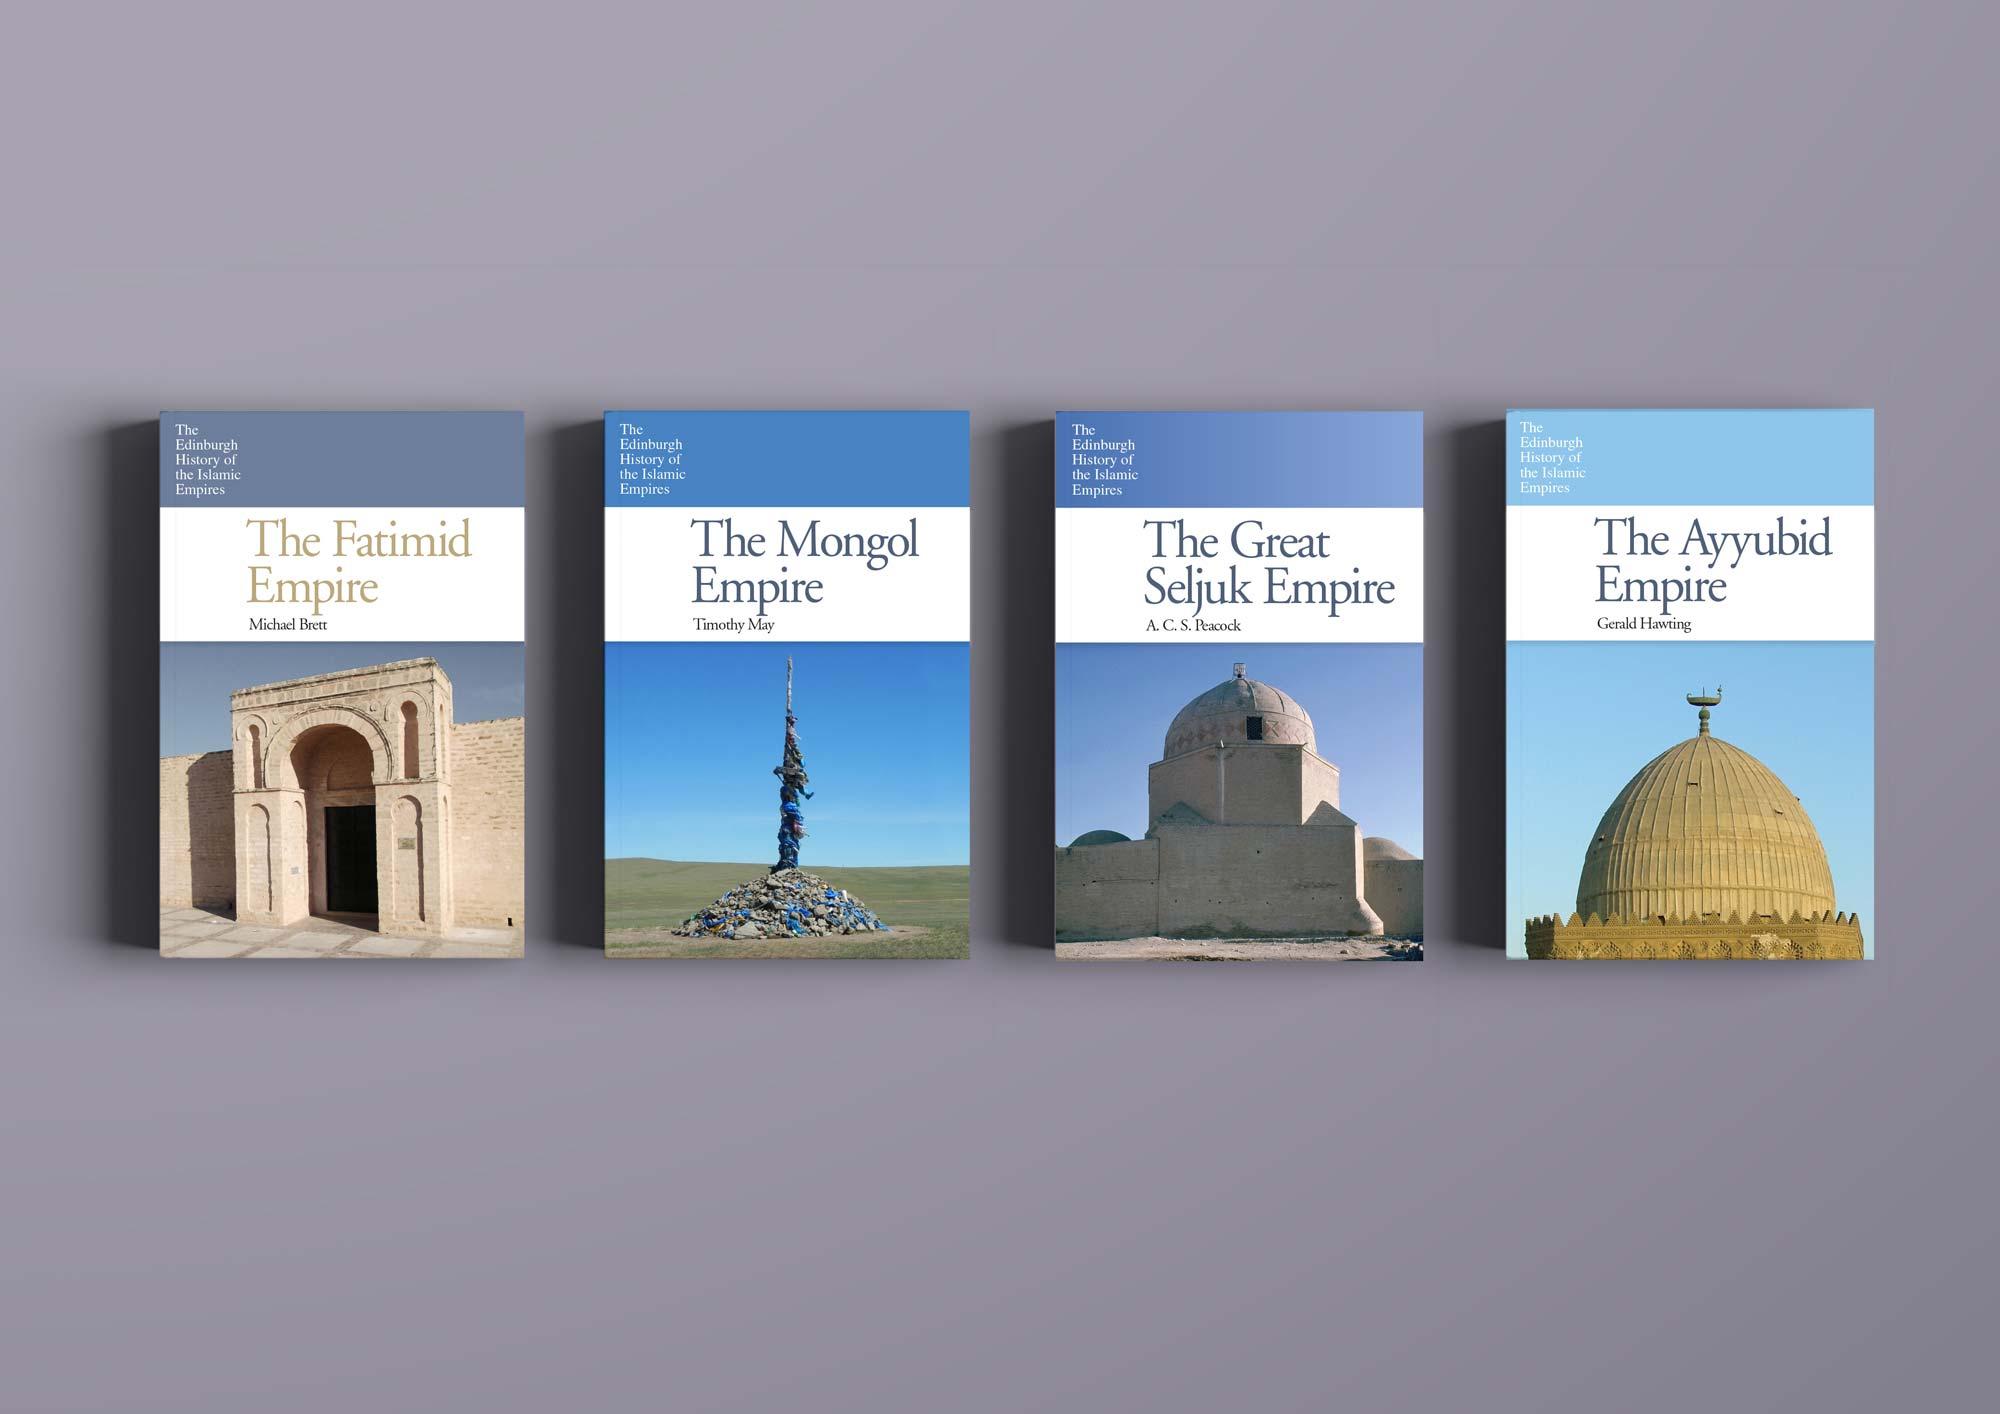 EUP__History-of-Islamic-Empires_series_richardbudddesign.jpg